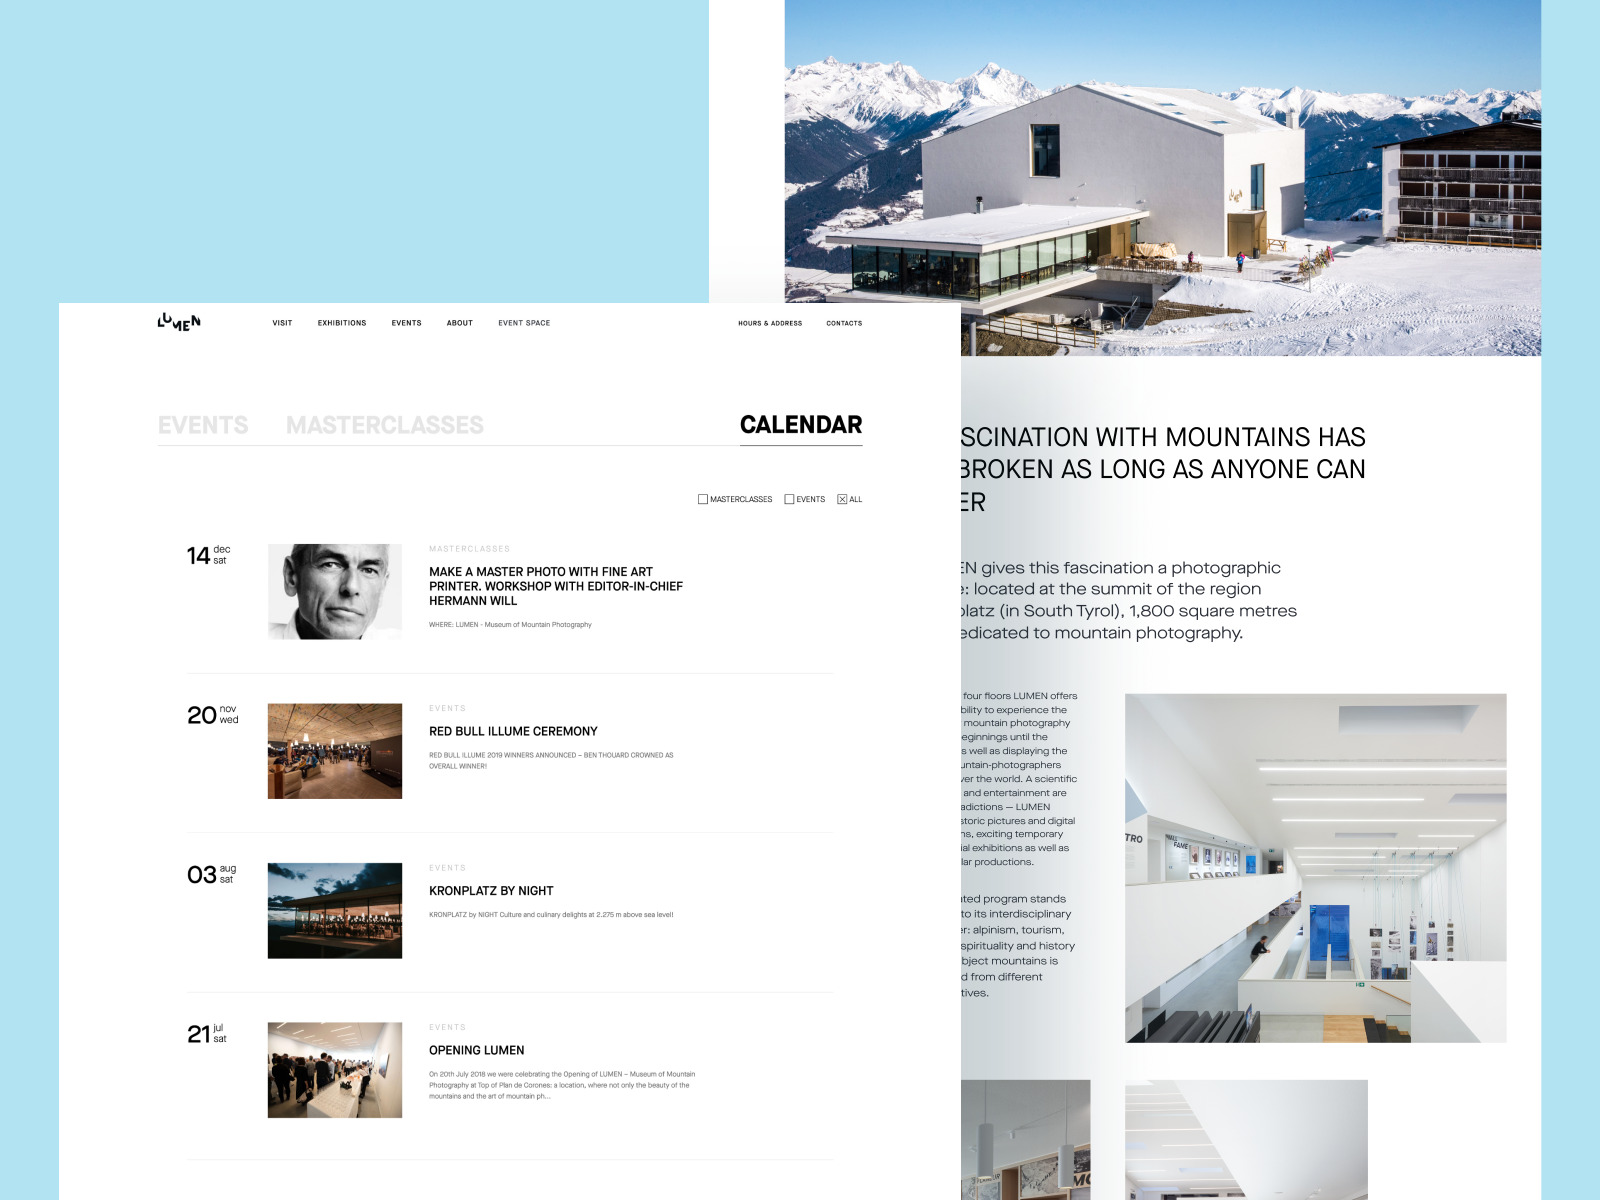 lumen museum website calendar page